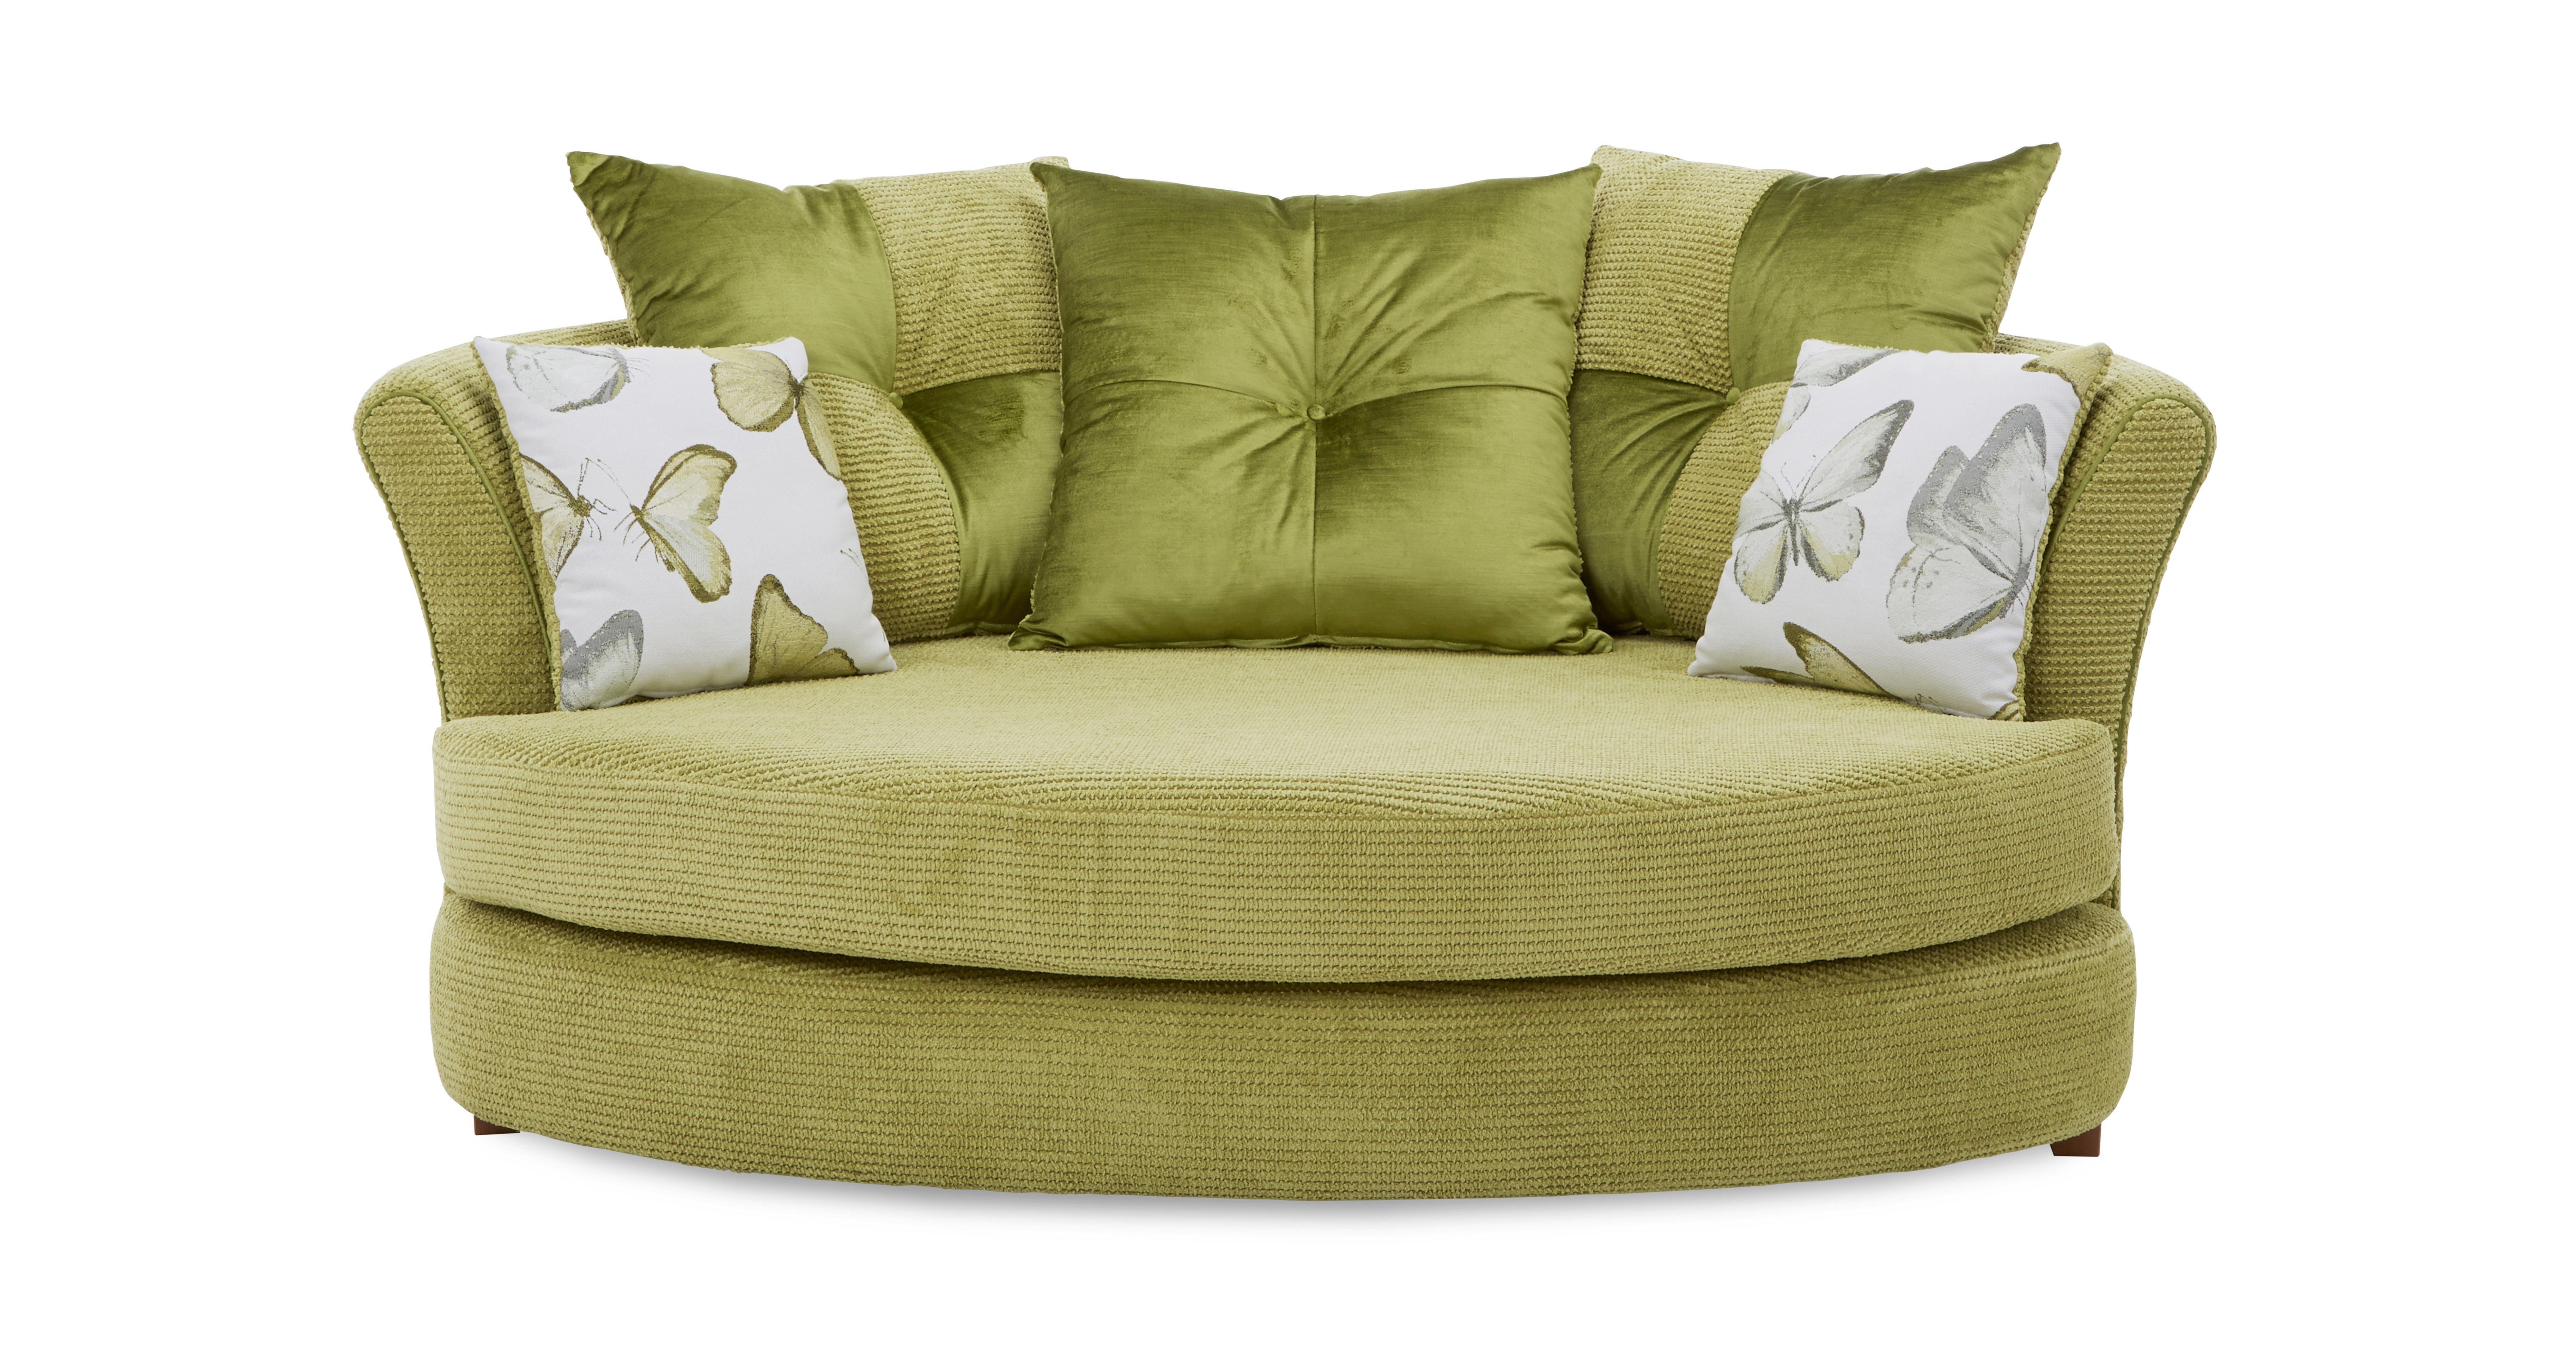 lime sofa chair beliani copenhagen contemporary italian design sectional inspirational green accent rtty1